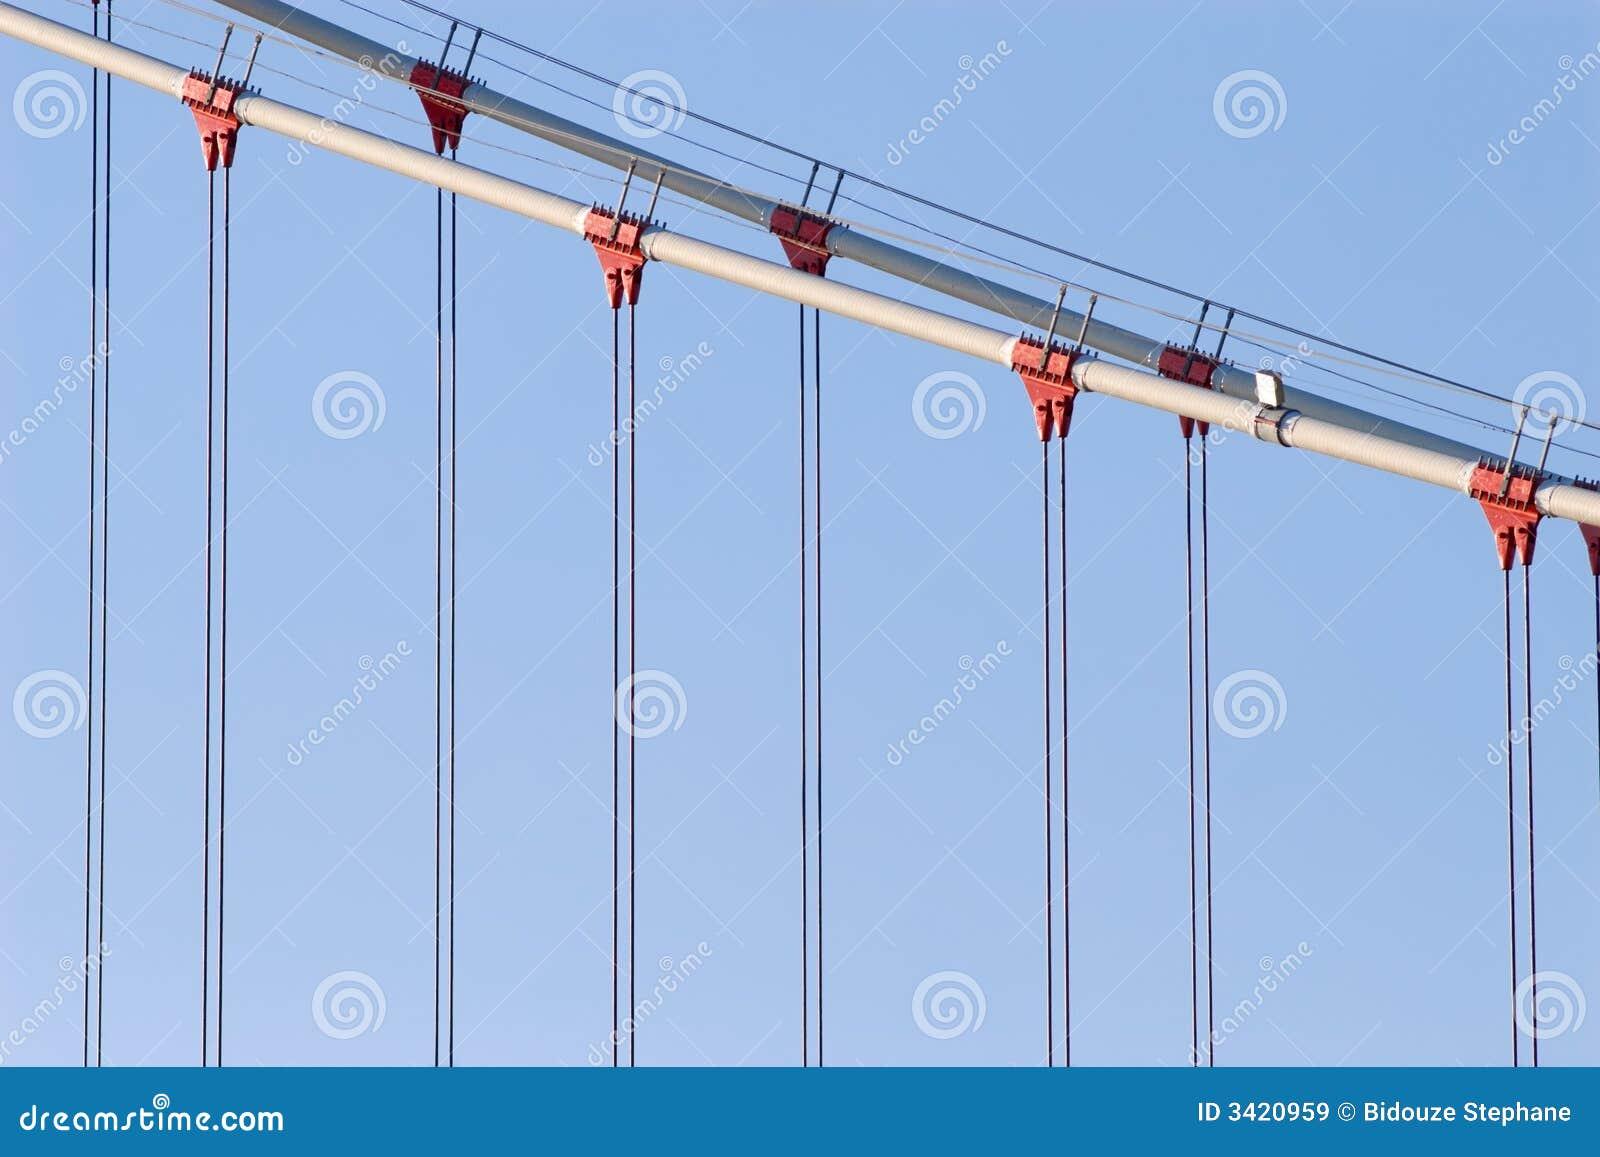 simcity how to connect sky bridge